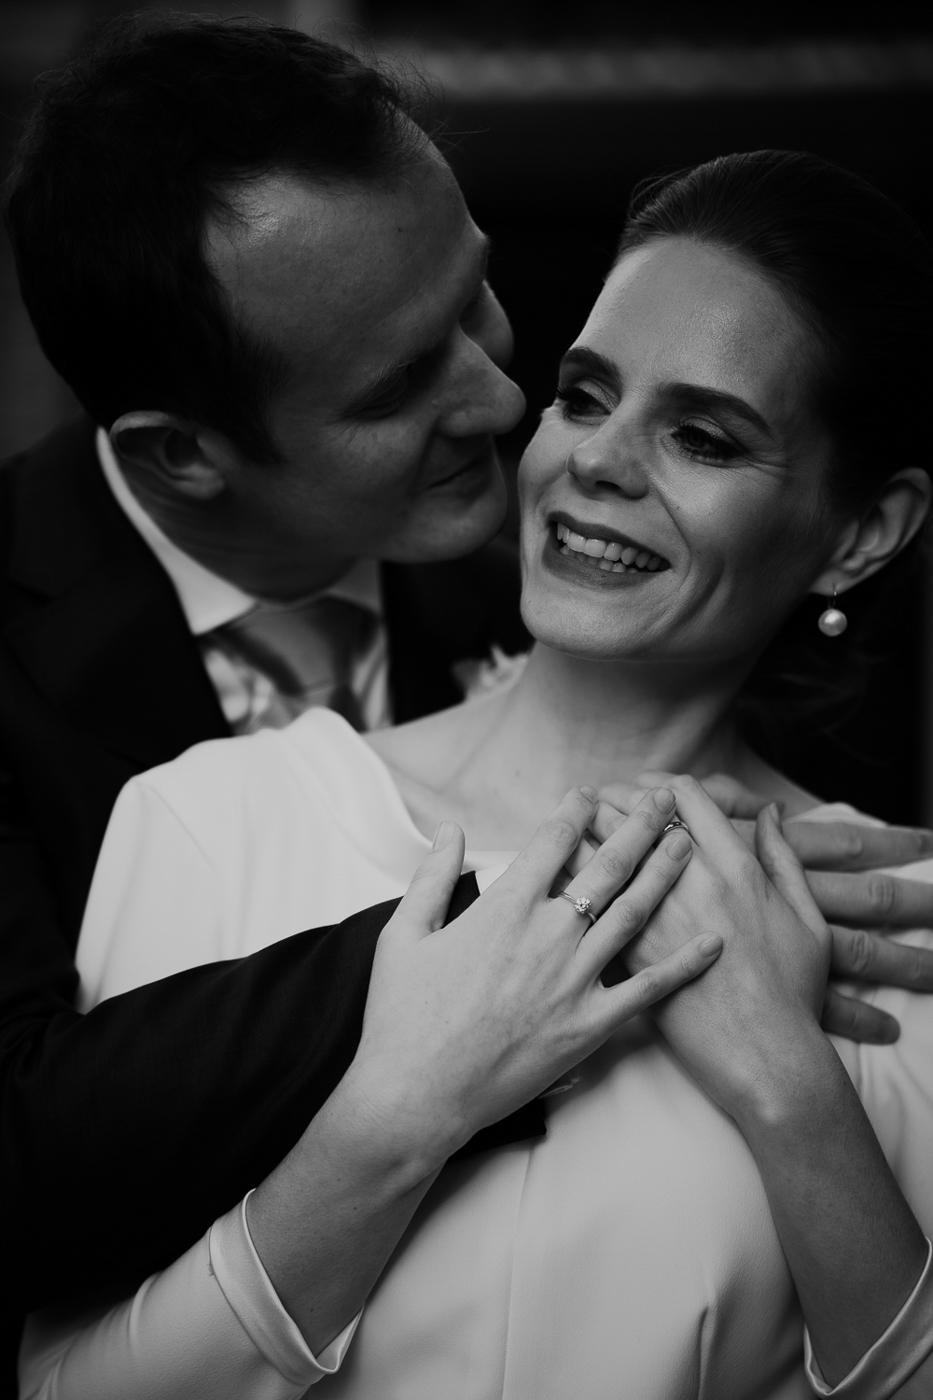 bruidsfotografie-trouwfotograaf-wedding-photographer-amsterdam-James-Jantine-287-2.jpg